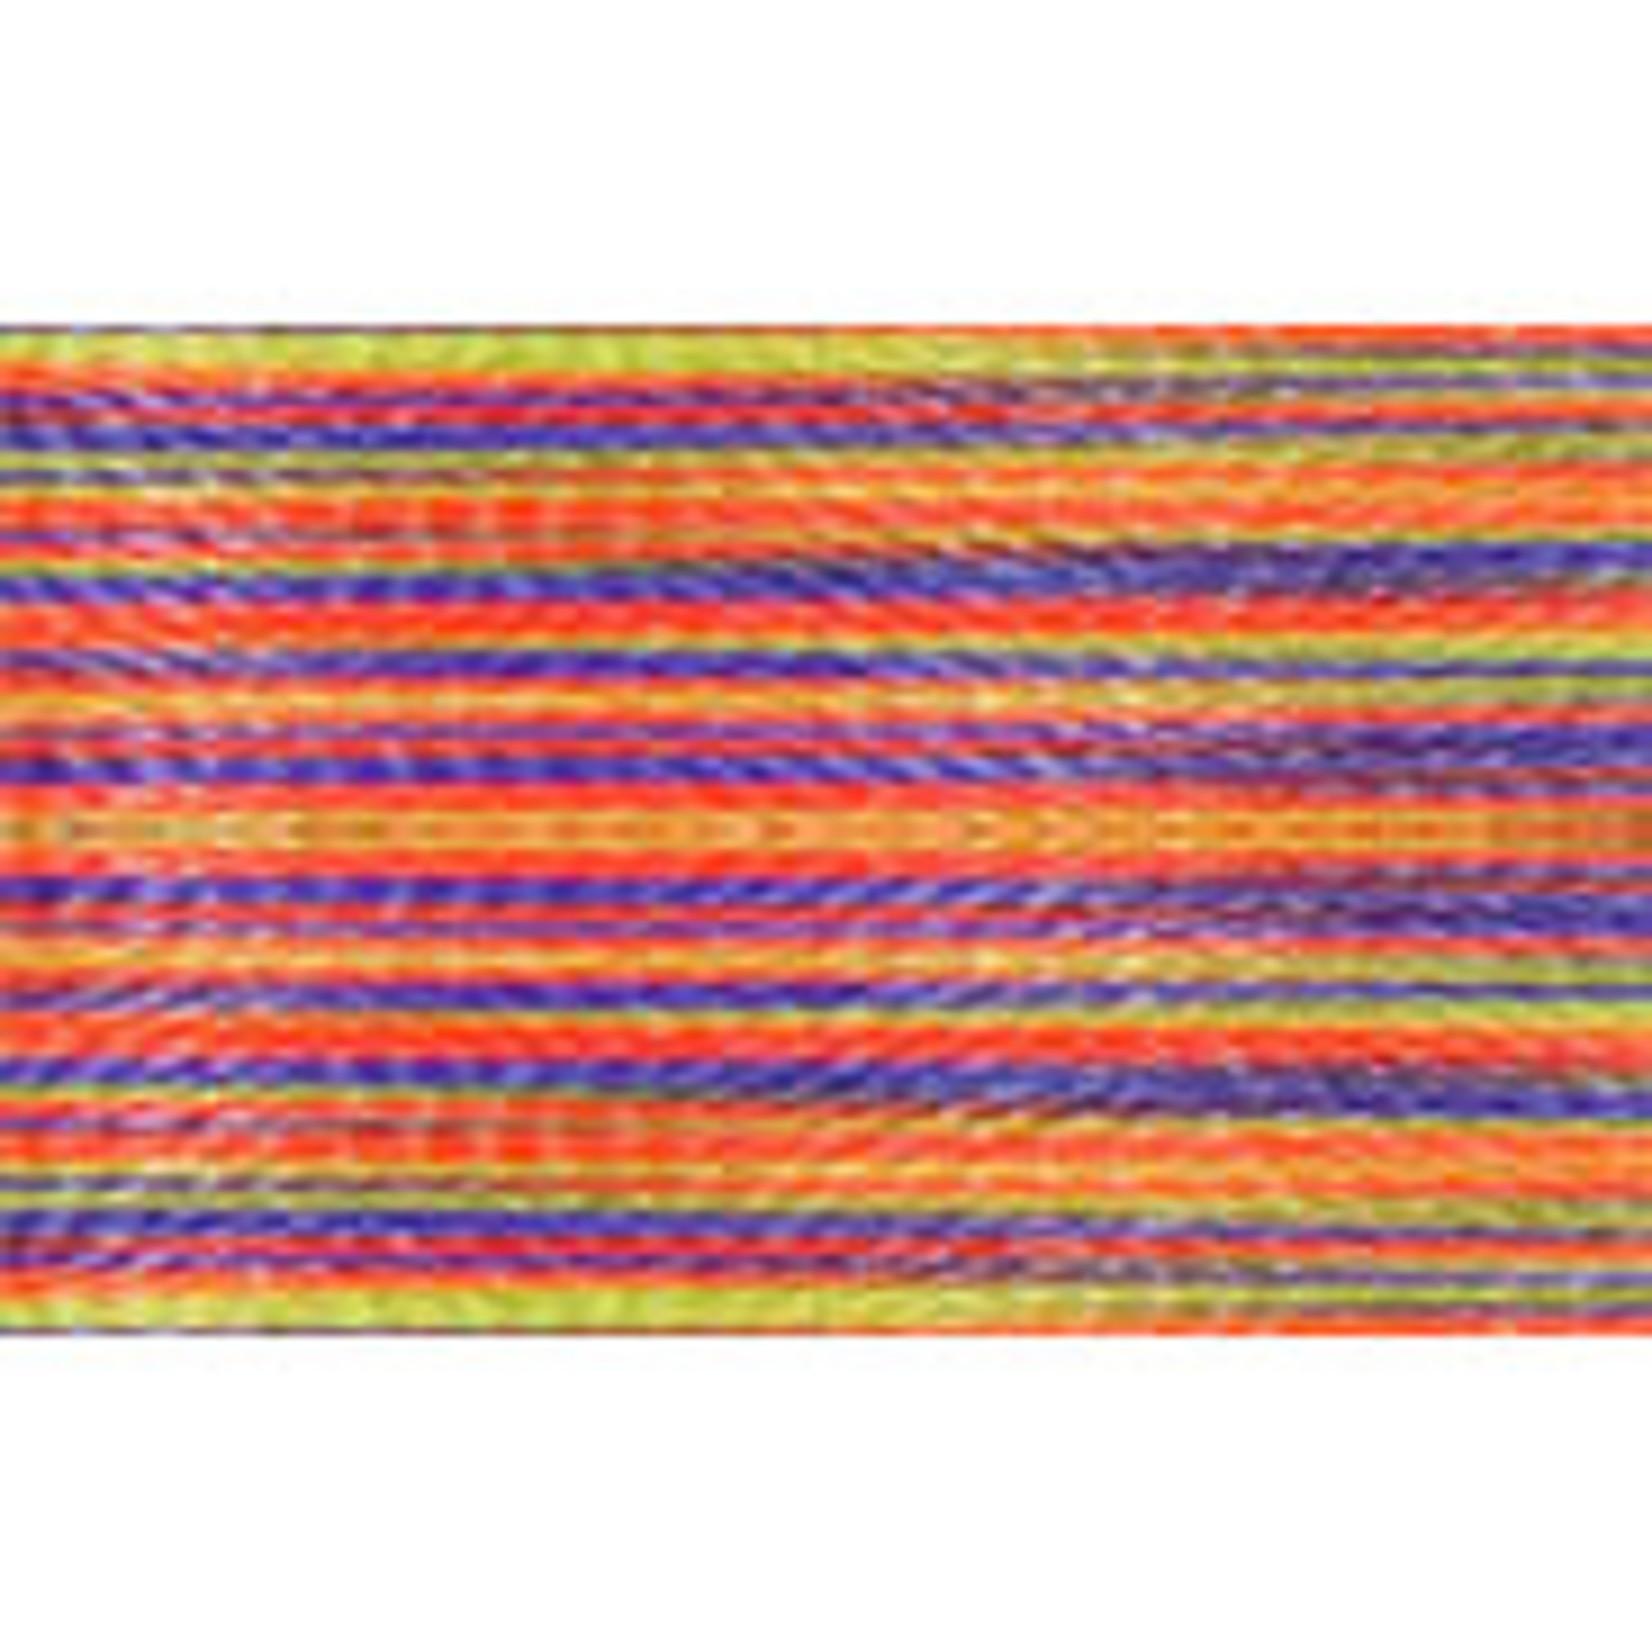 Amann Mettler Isacord Multi - #40 - 1000 m - 9981